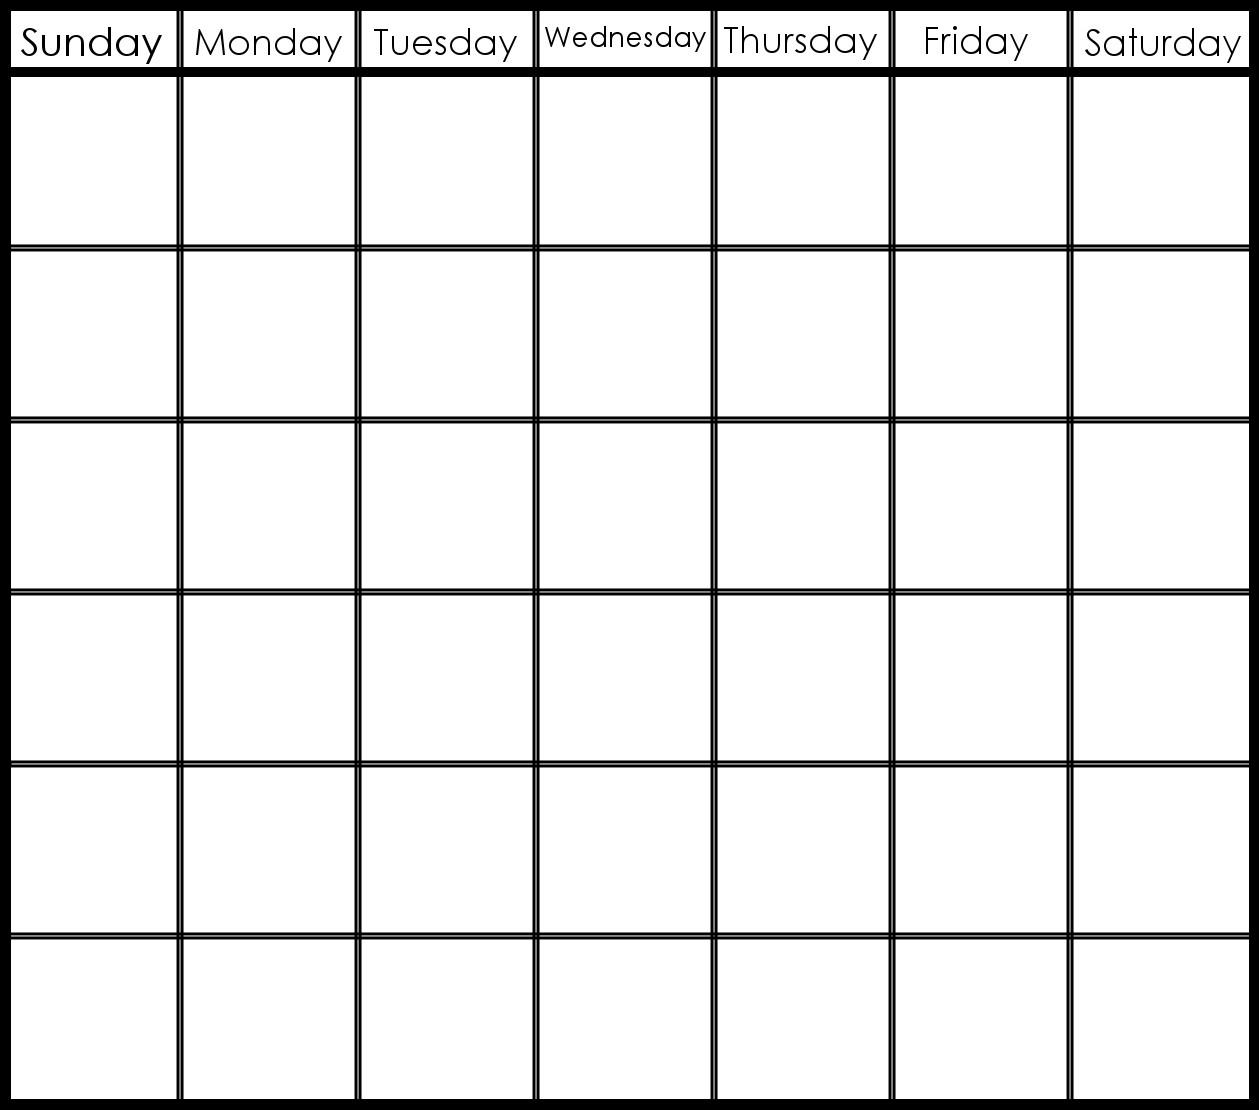 6 Week Printable Calendar | Printable Calendar Templates 2019-6 Week_Blank Calendar Template 6 Weeks